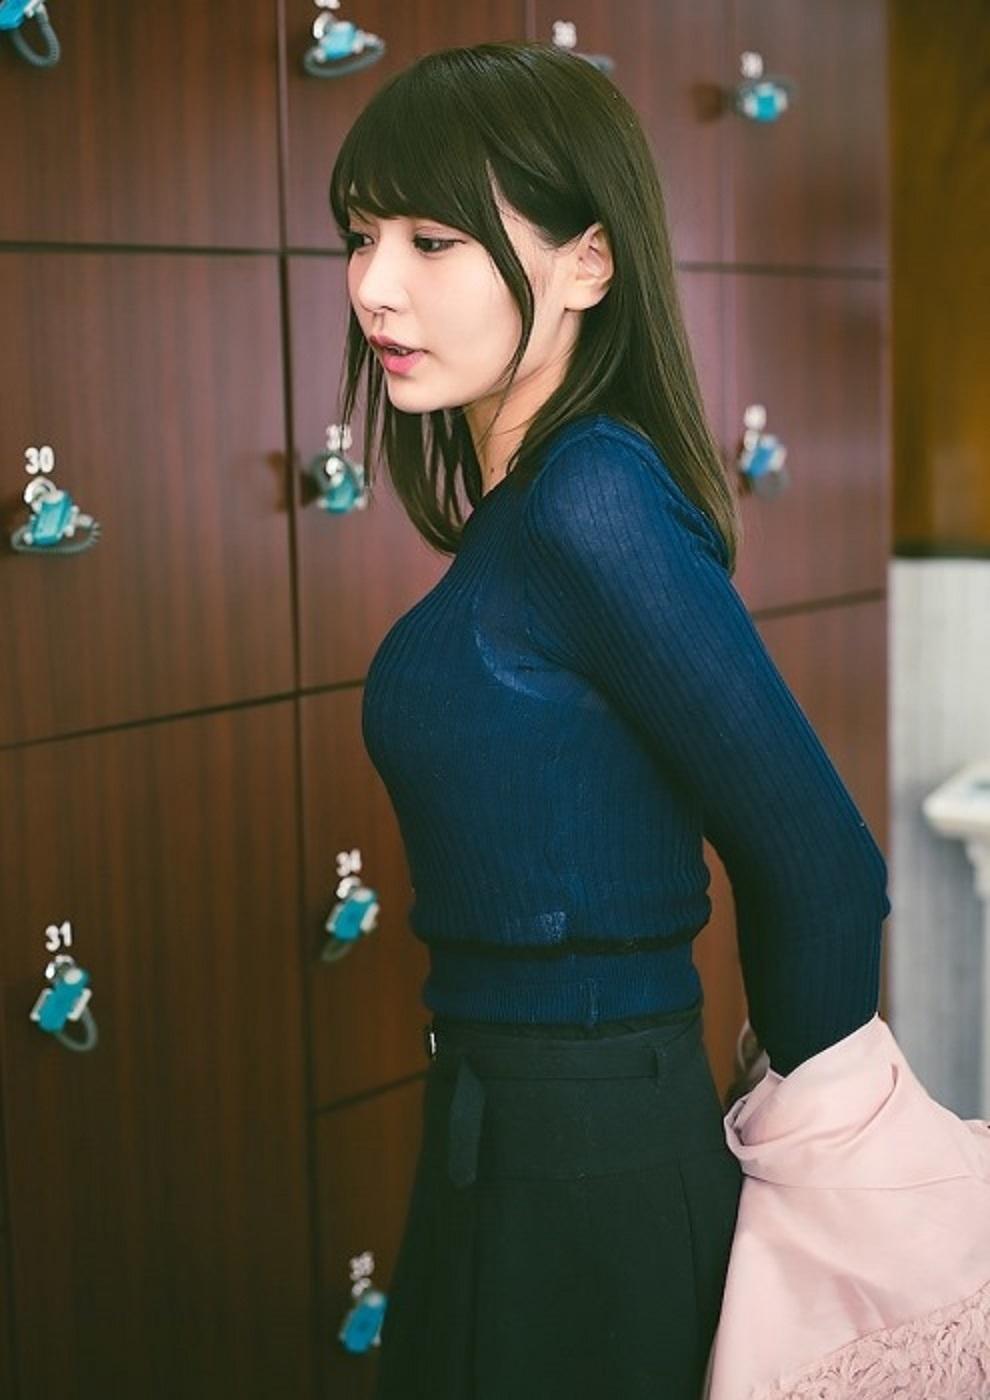 nitori_sayaka100.jpg